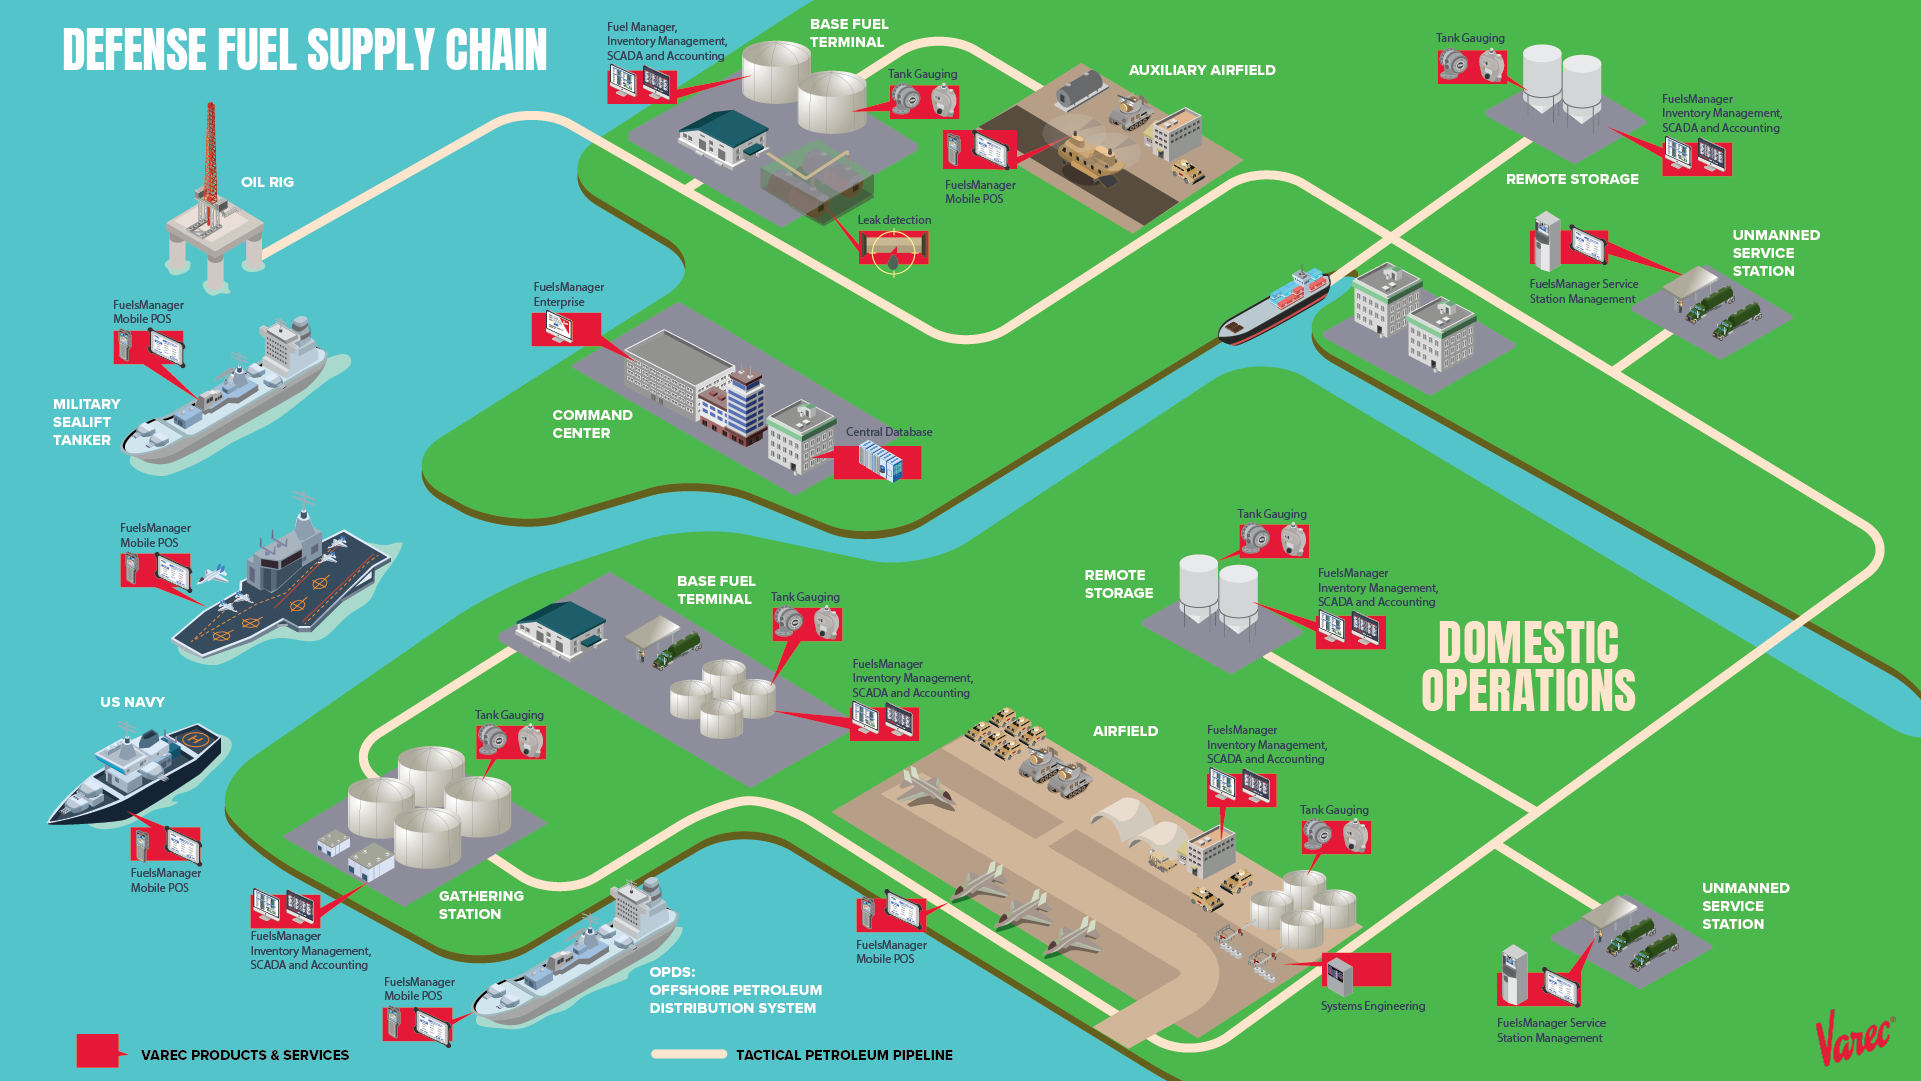 Proven Bulk Fuel Management Solutions for the Defense